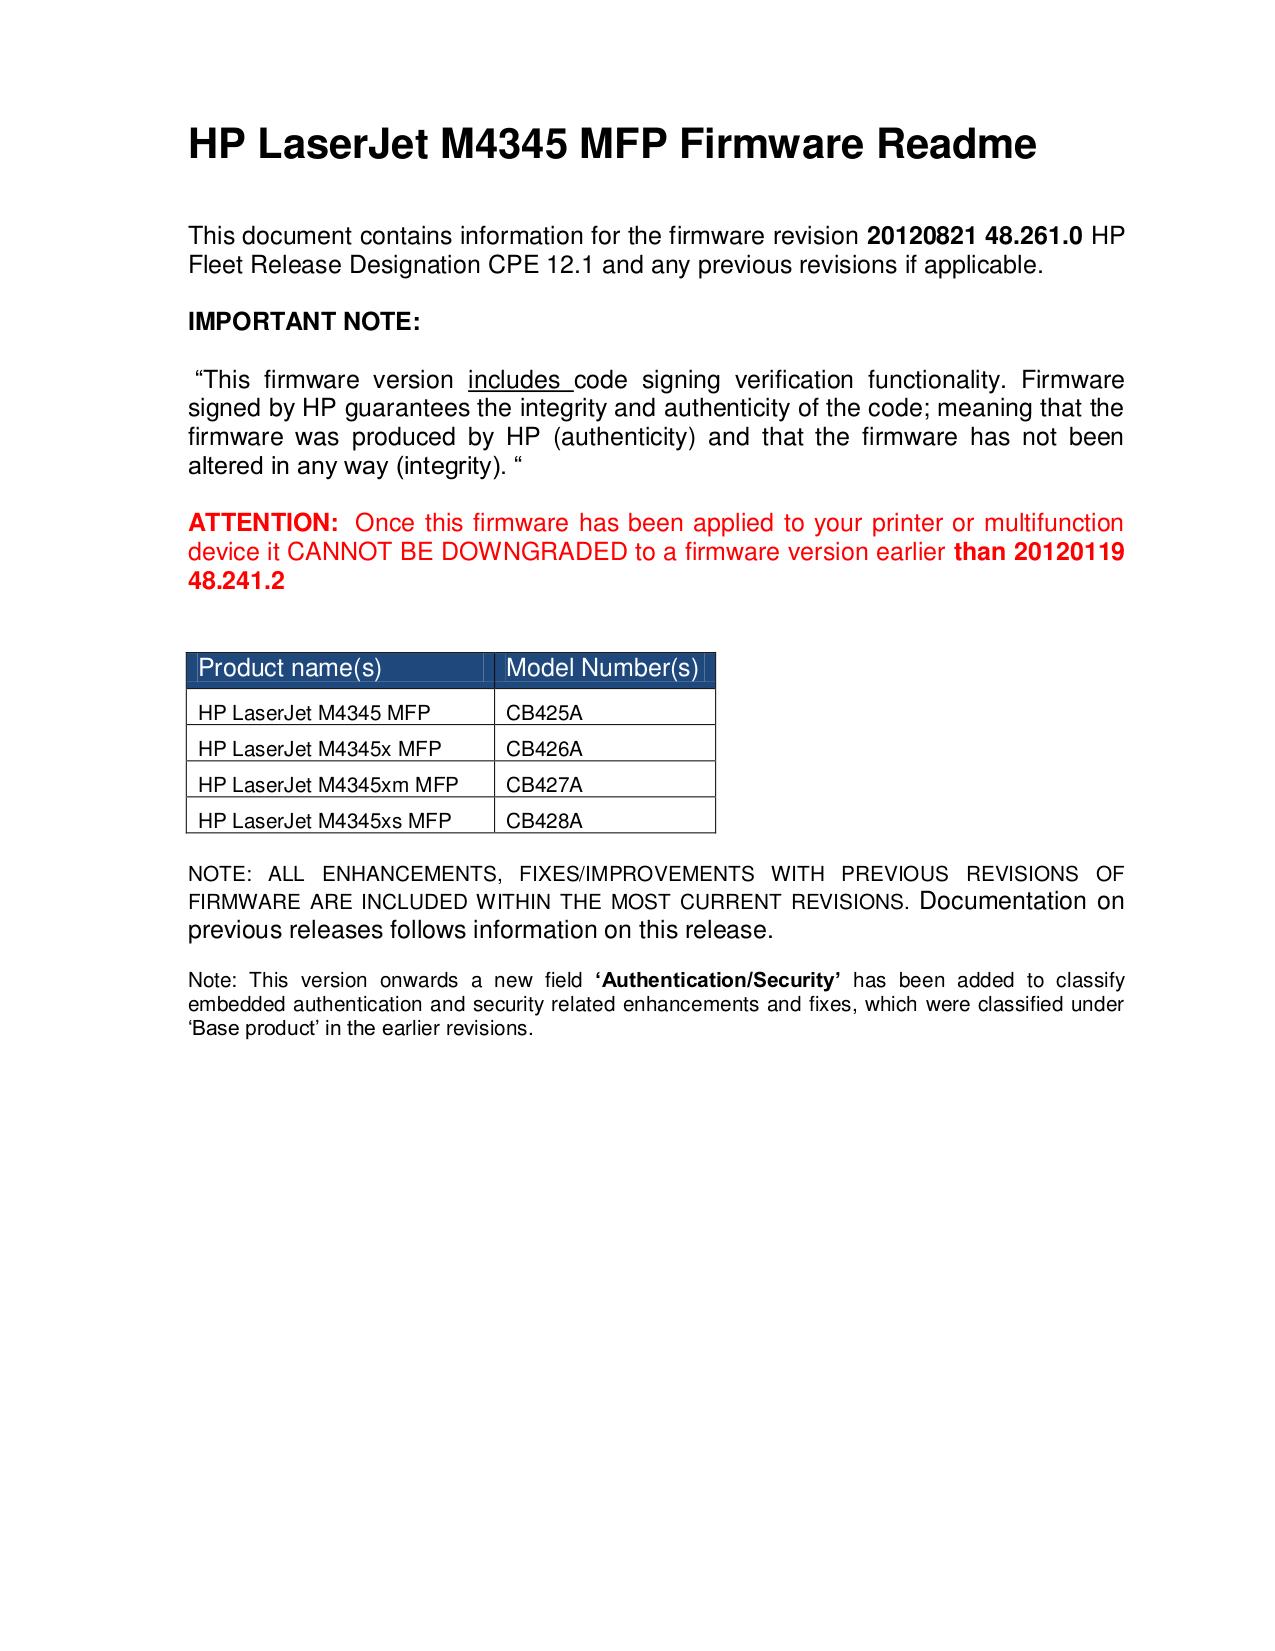 pdf for HP Multifunction Printer Laserjet,Color Laserjet M4345xm manual